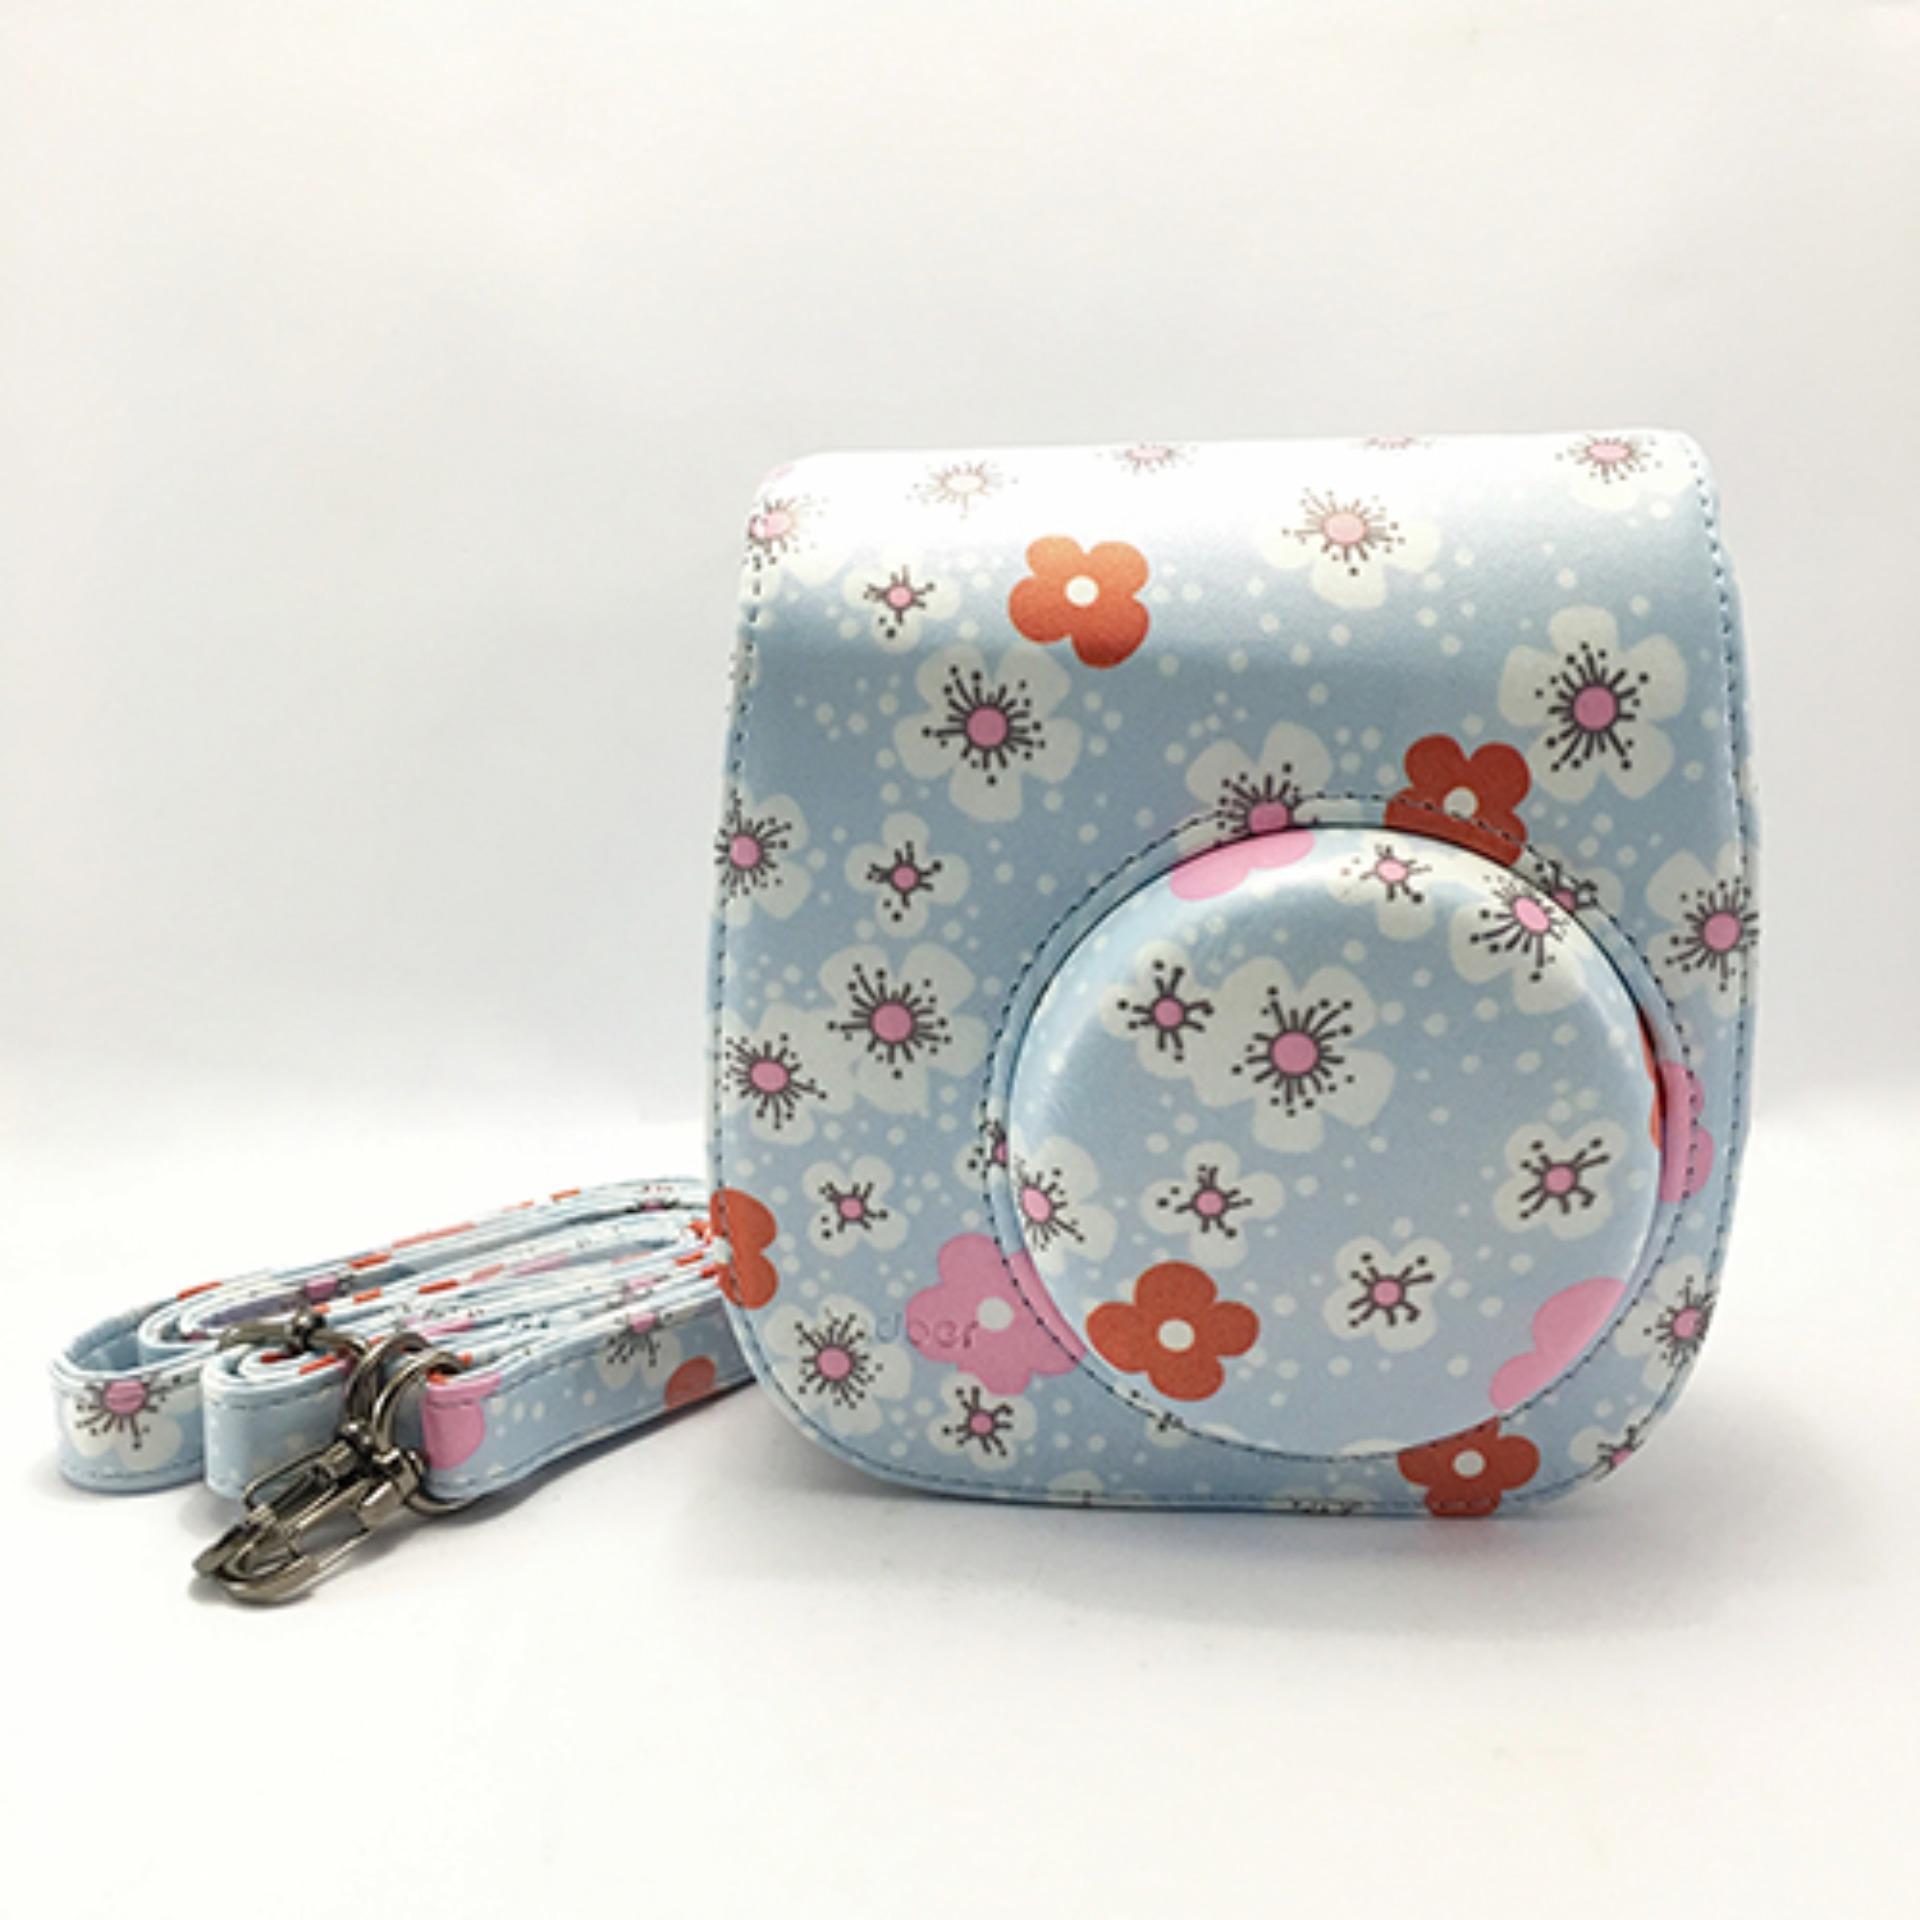 Instax Mini 8 Leather Bag - Cherry Blossom